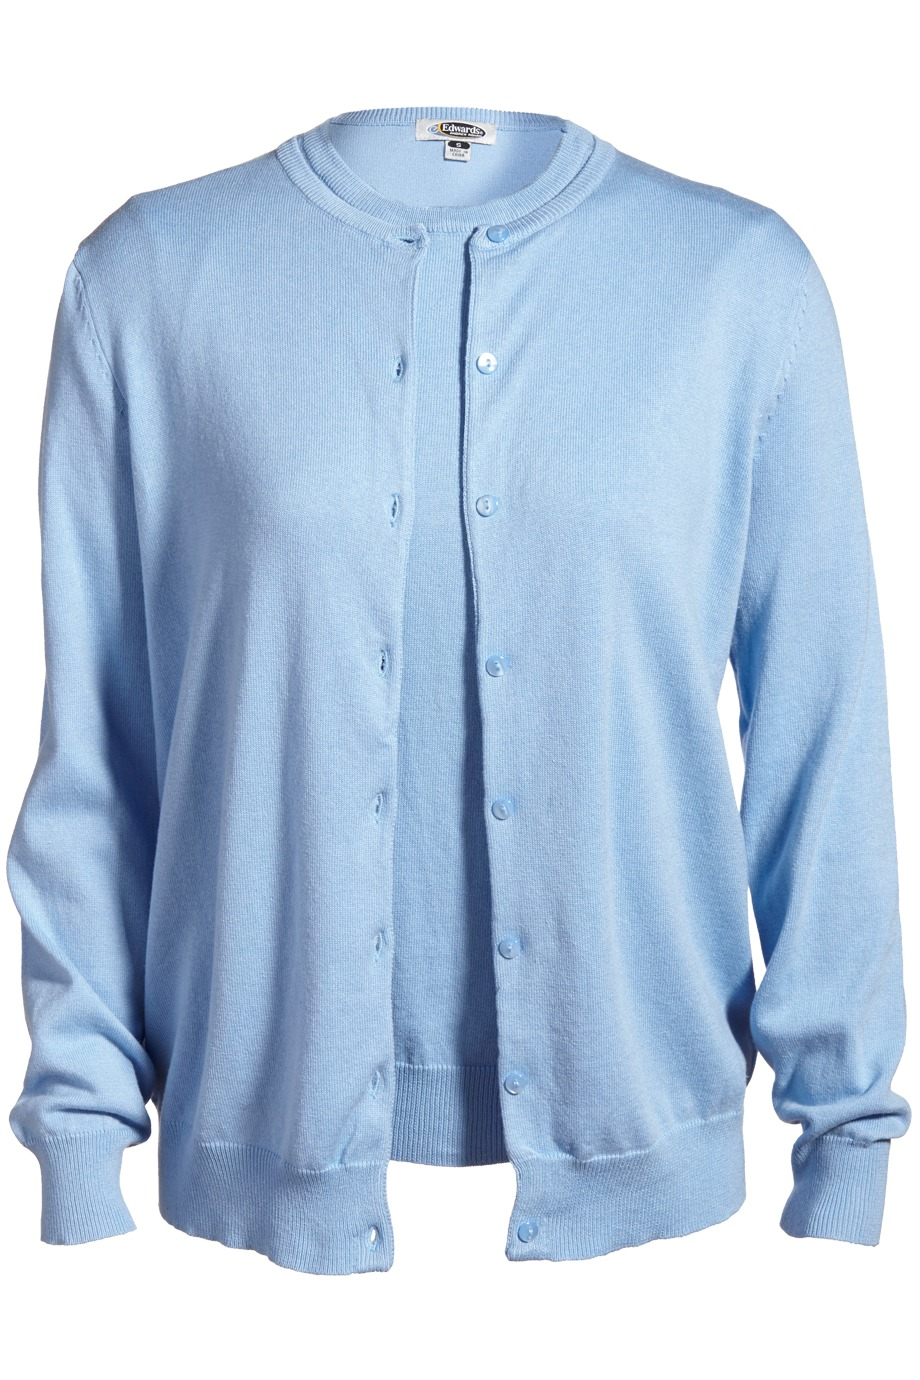 Edwards Garment 038 - Women's Corporate Performance Twinset Jewel Neck